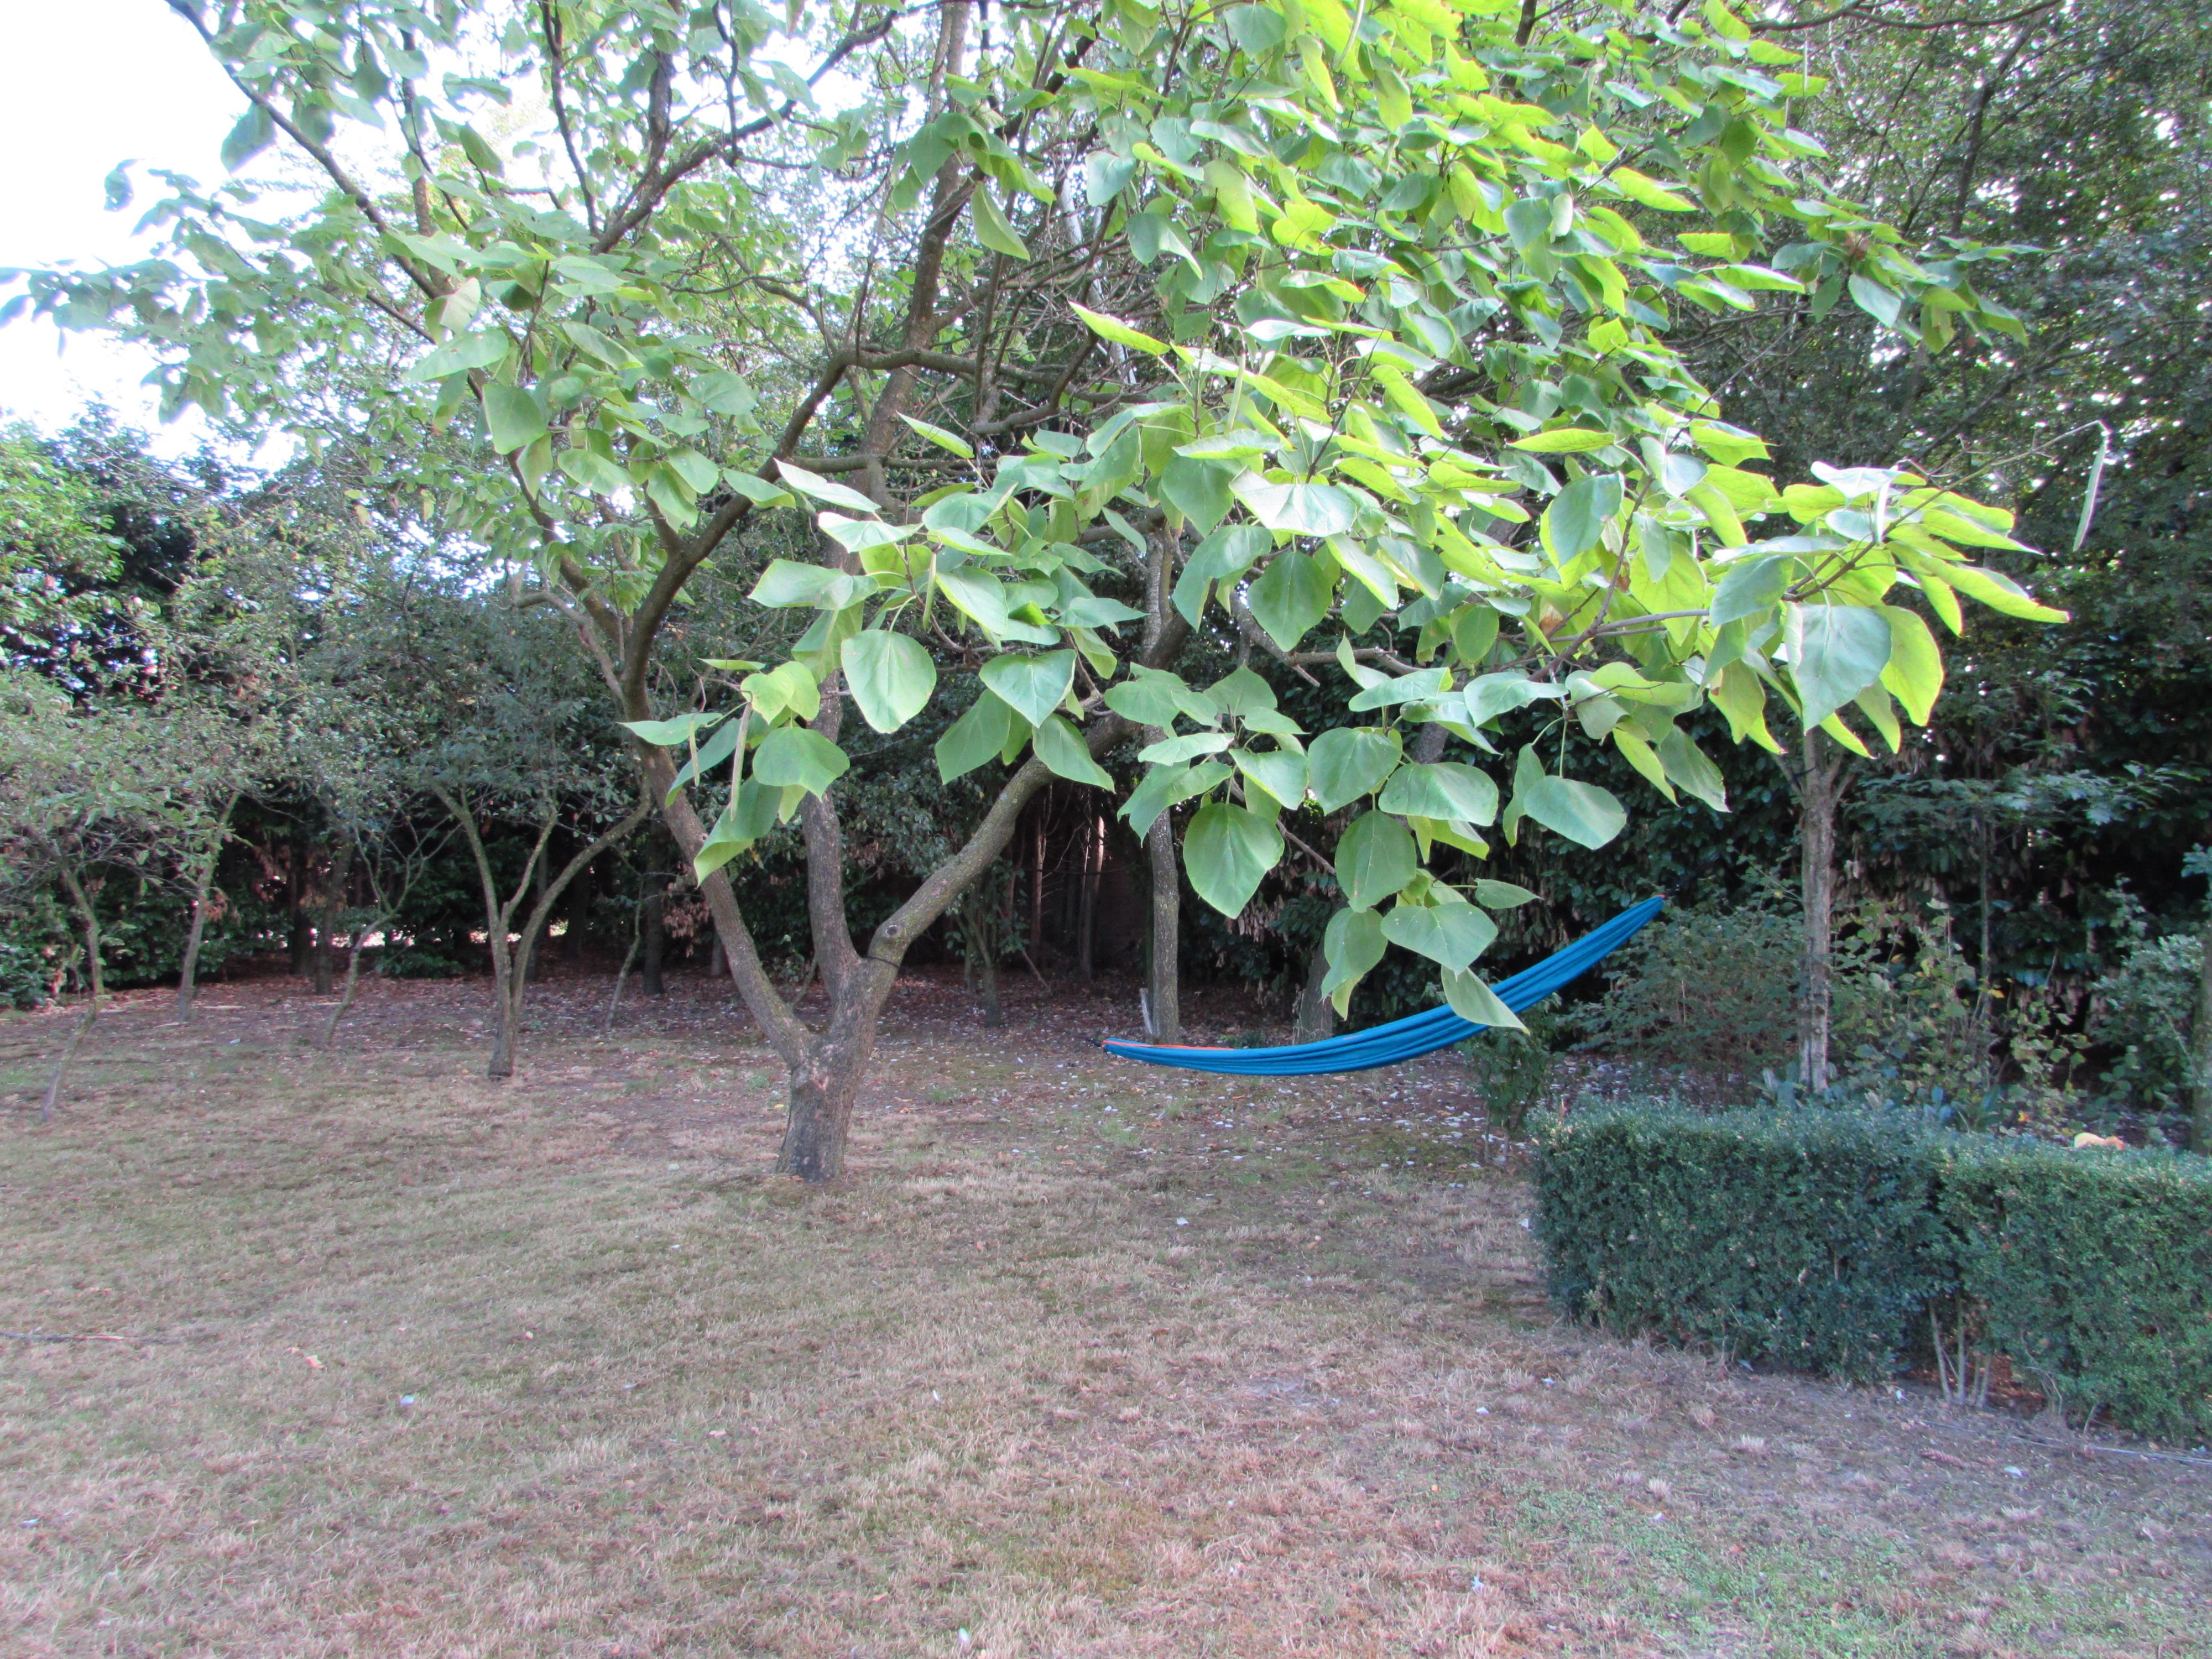 Hangmat tussen fruitbomen - kopie